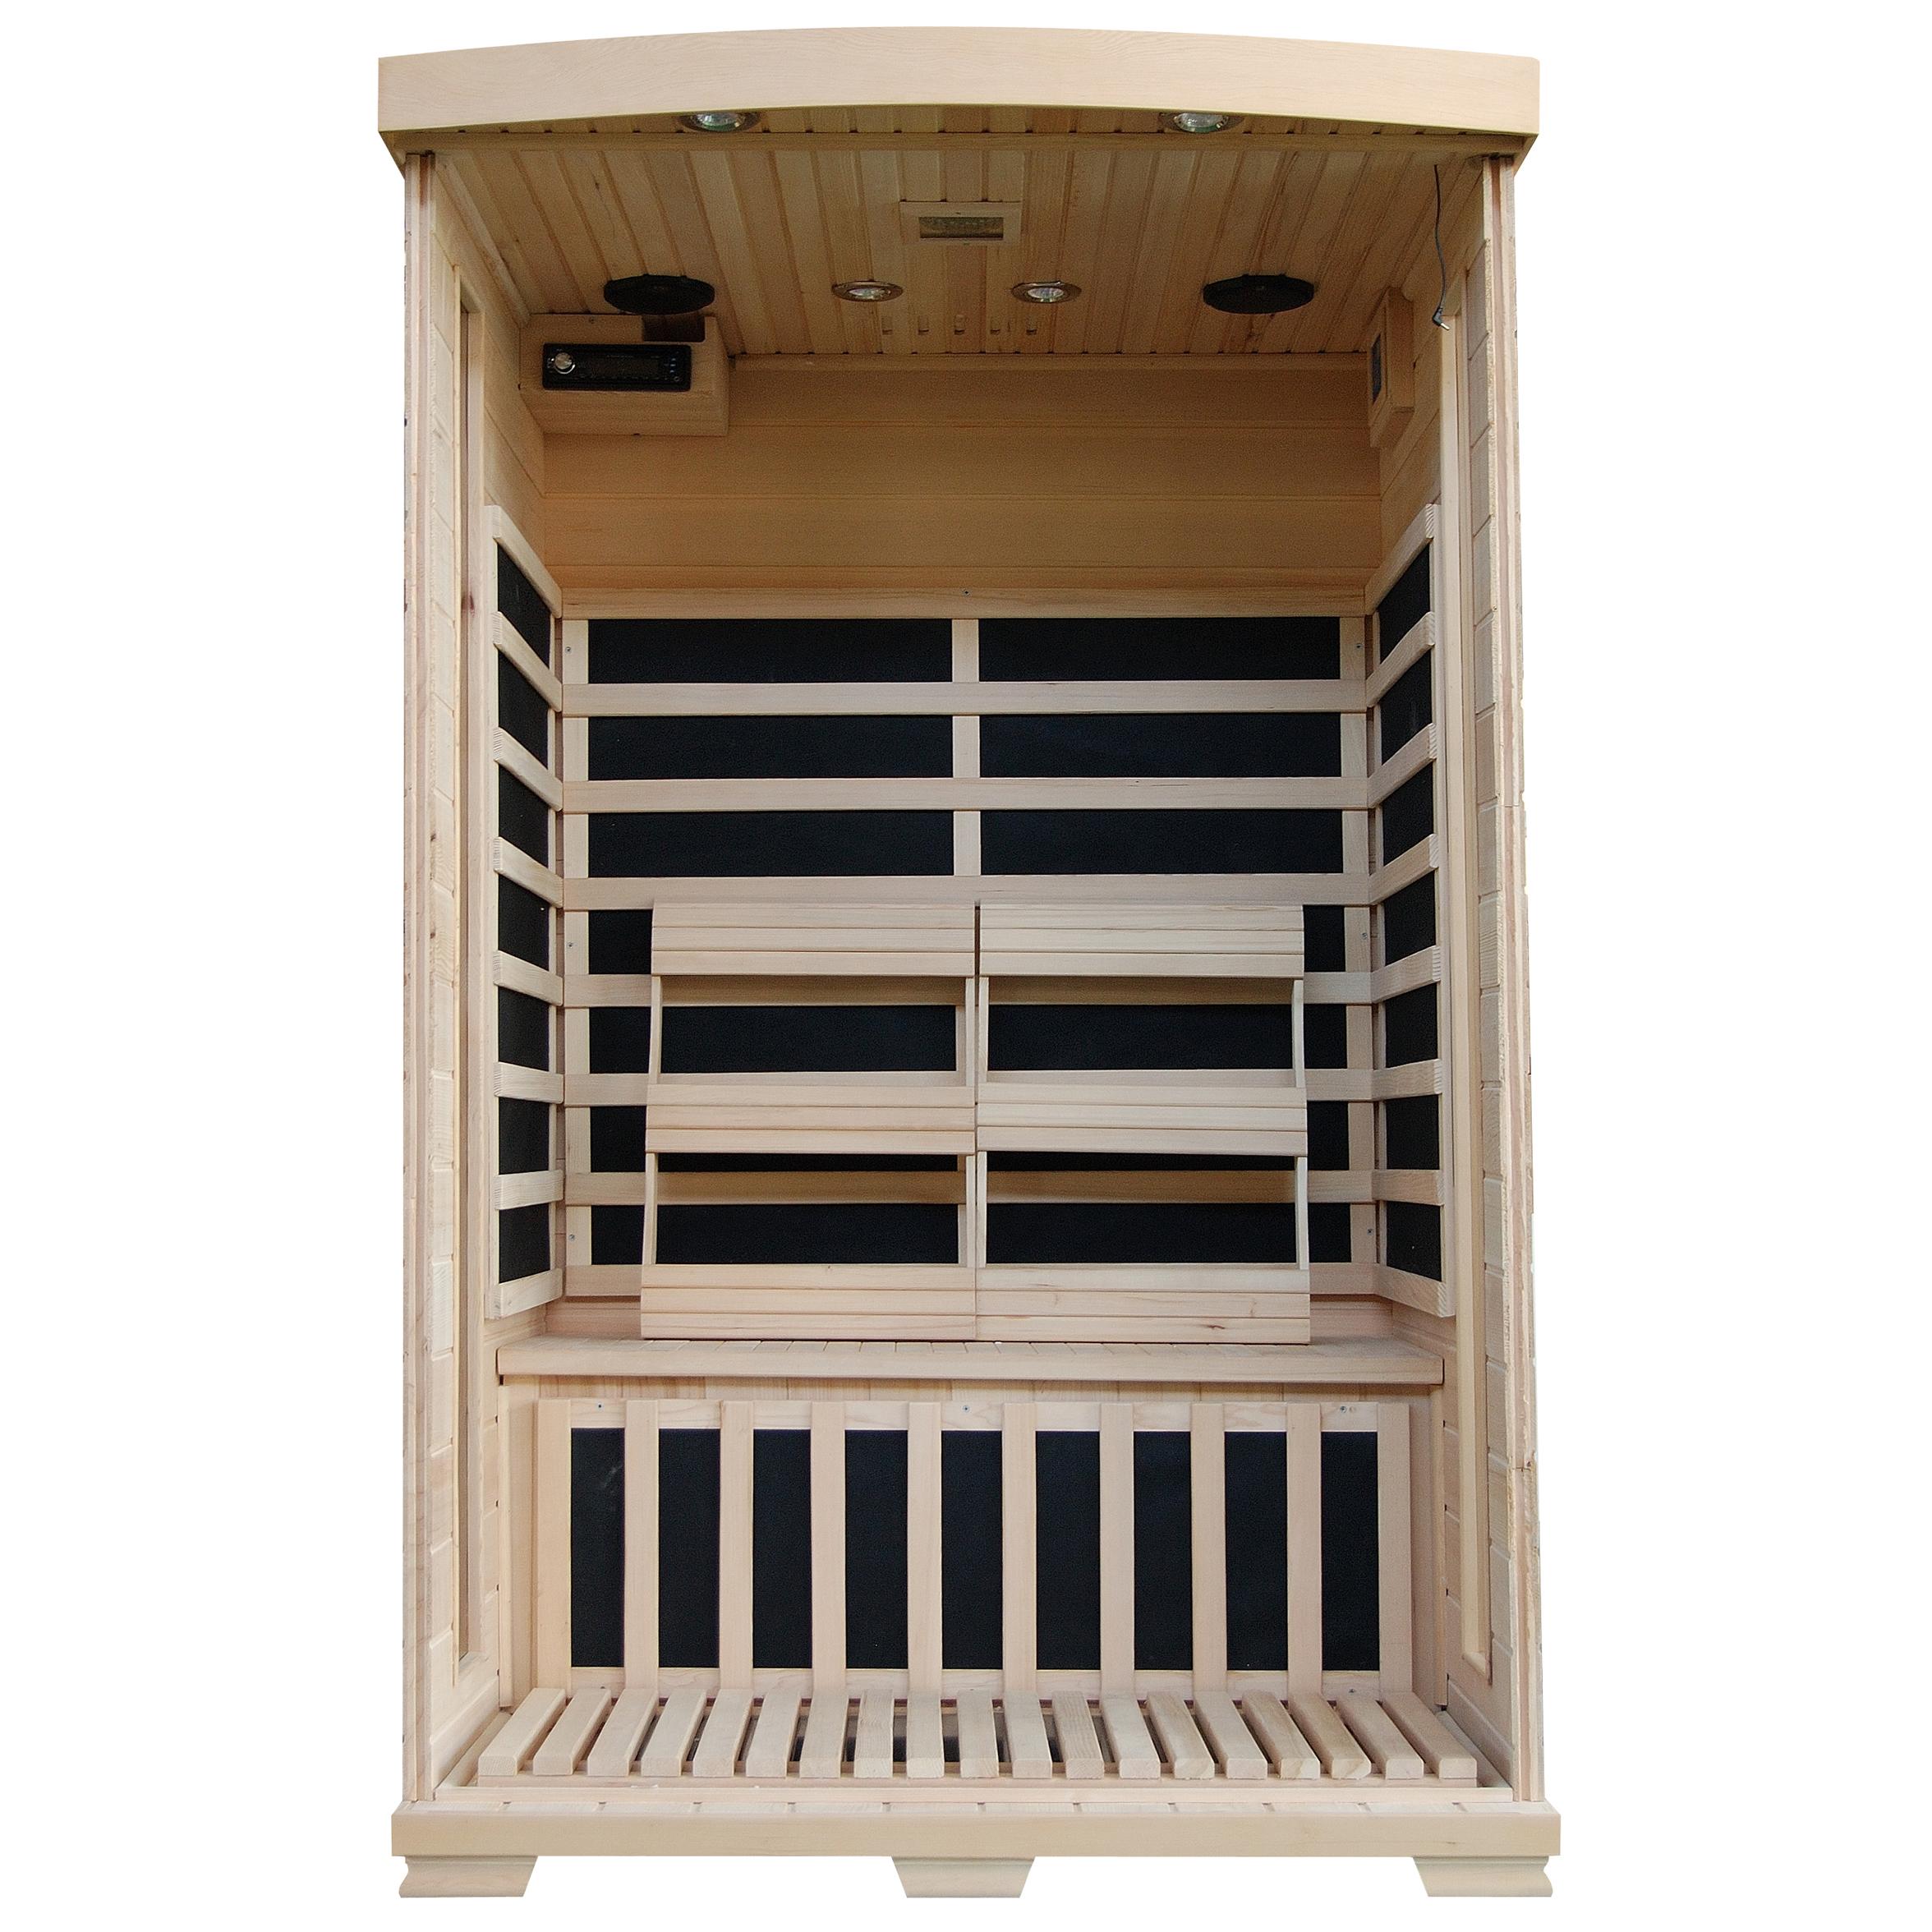 Blue Wave Heatwave Coronado Sauna 2 Person Ceramic Heater